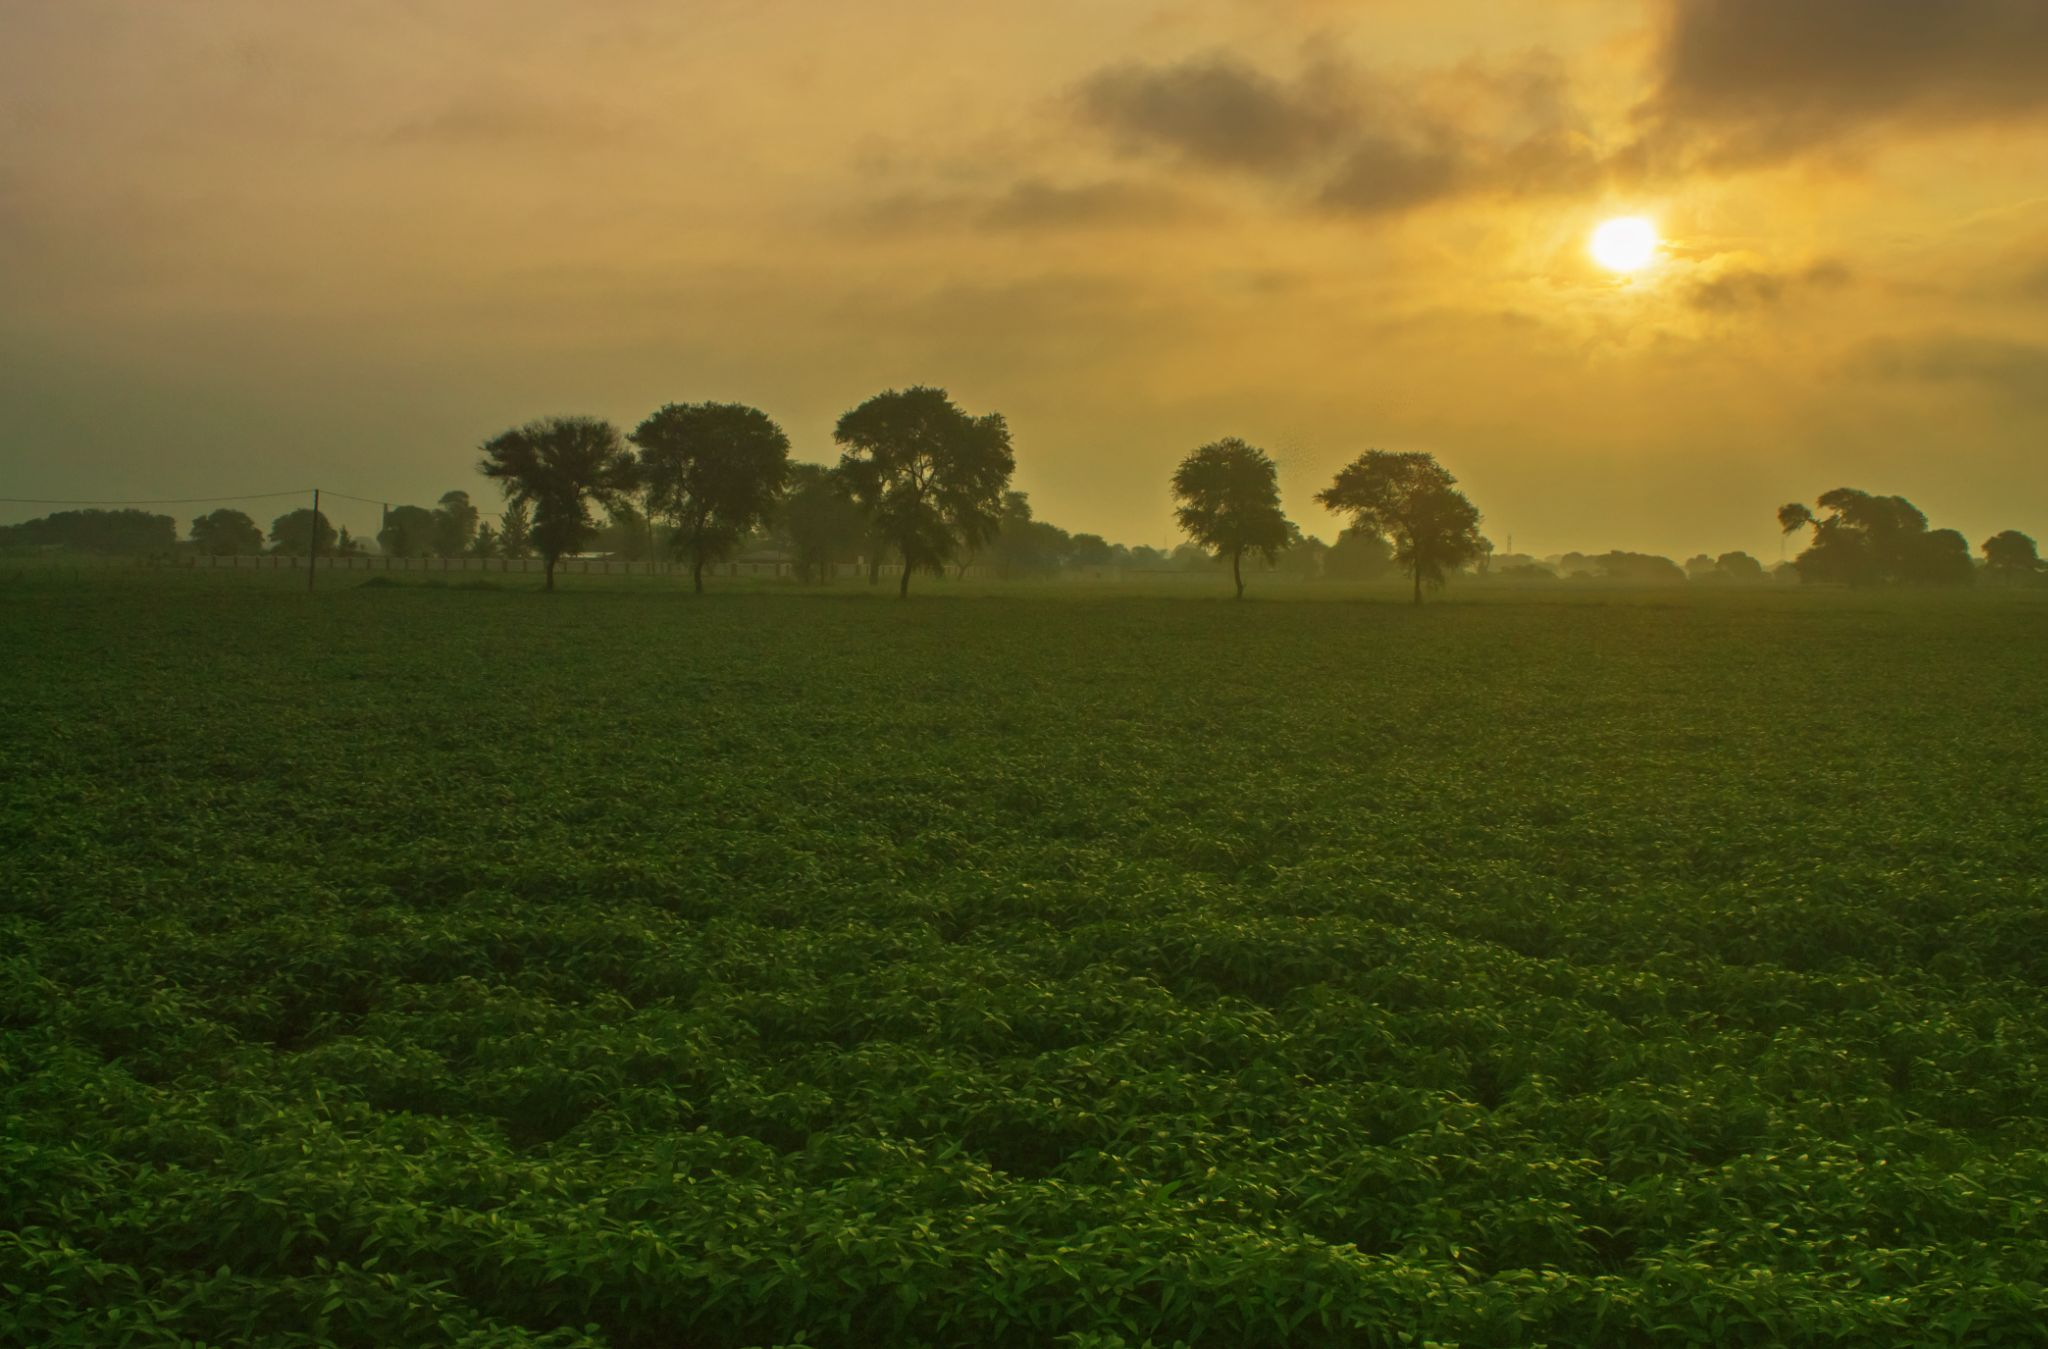 Morning Raga by Abhishek